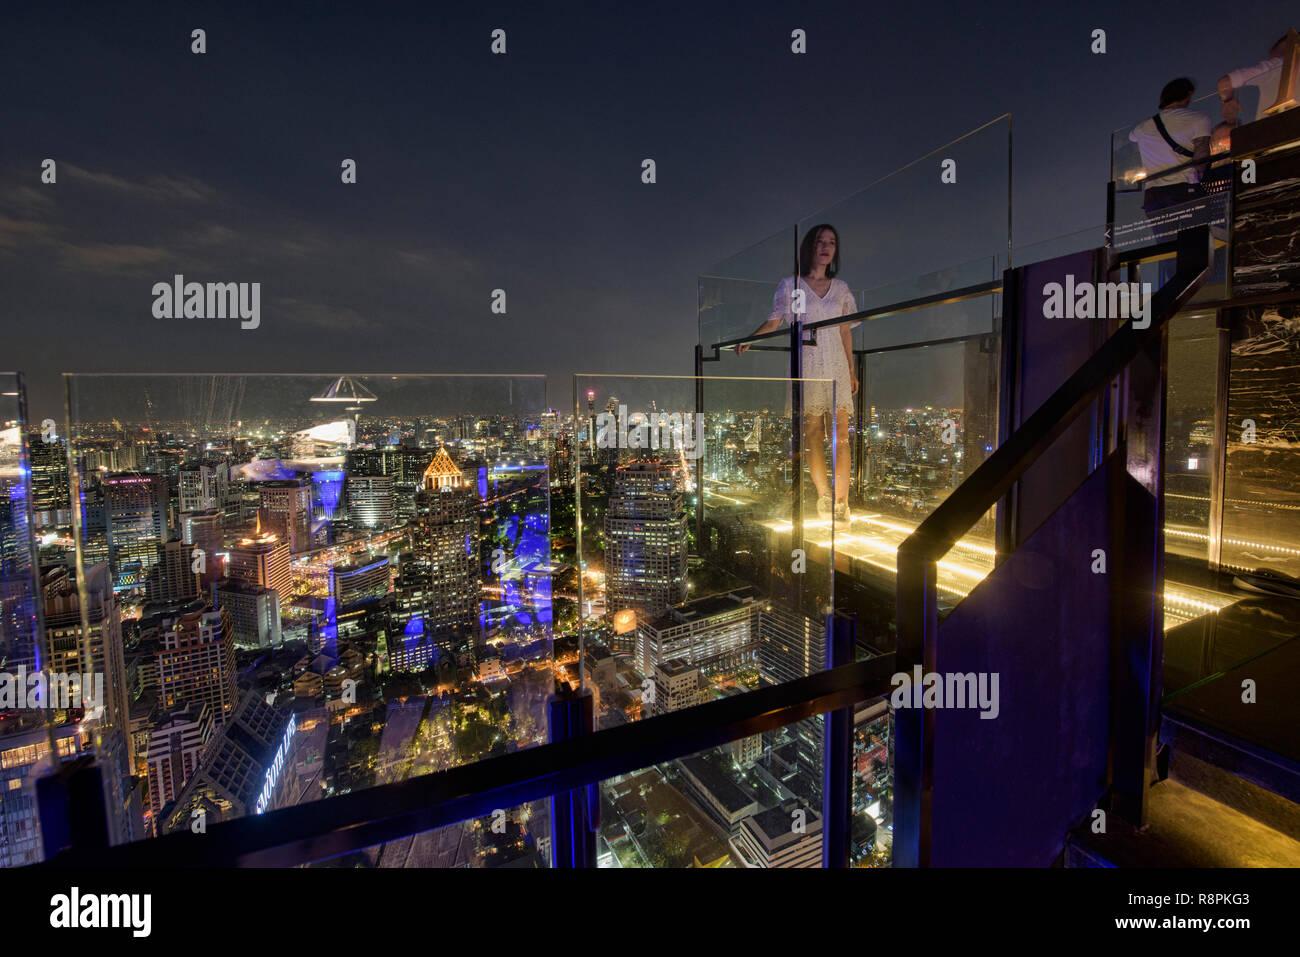 Looking out on the Bangkok cityscape from the Moon Bar, Bangkok, Thailand - Stock Image